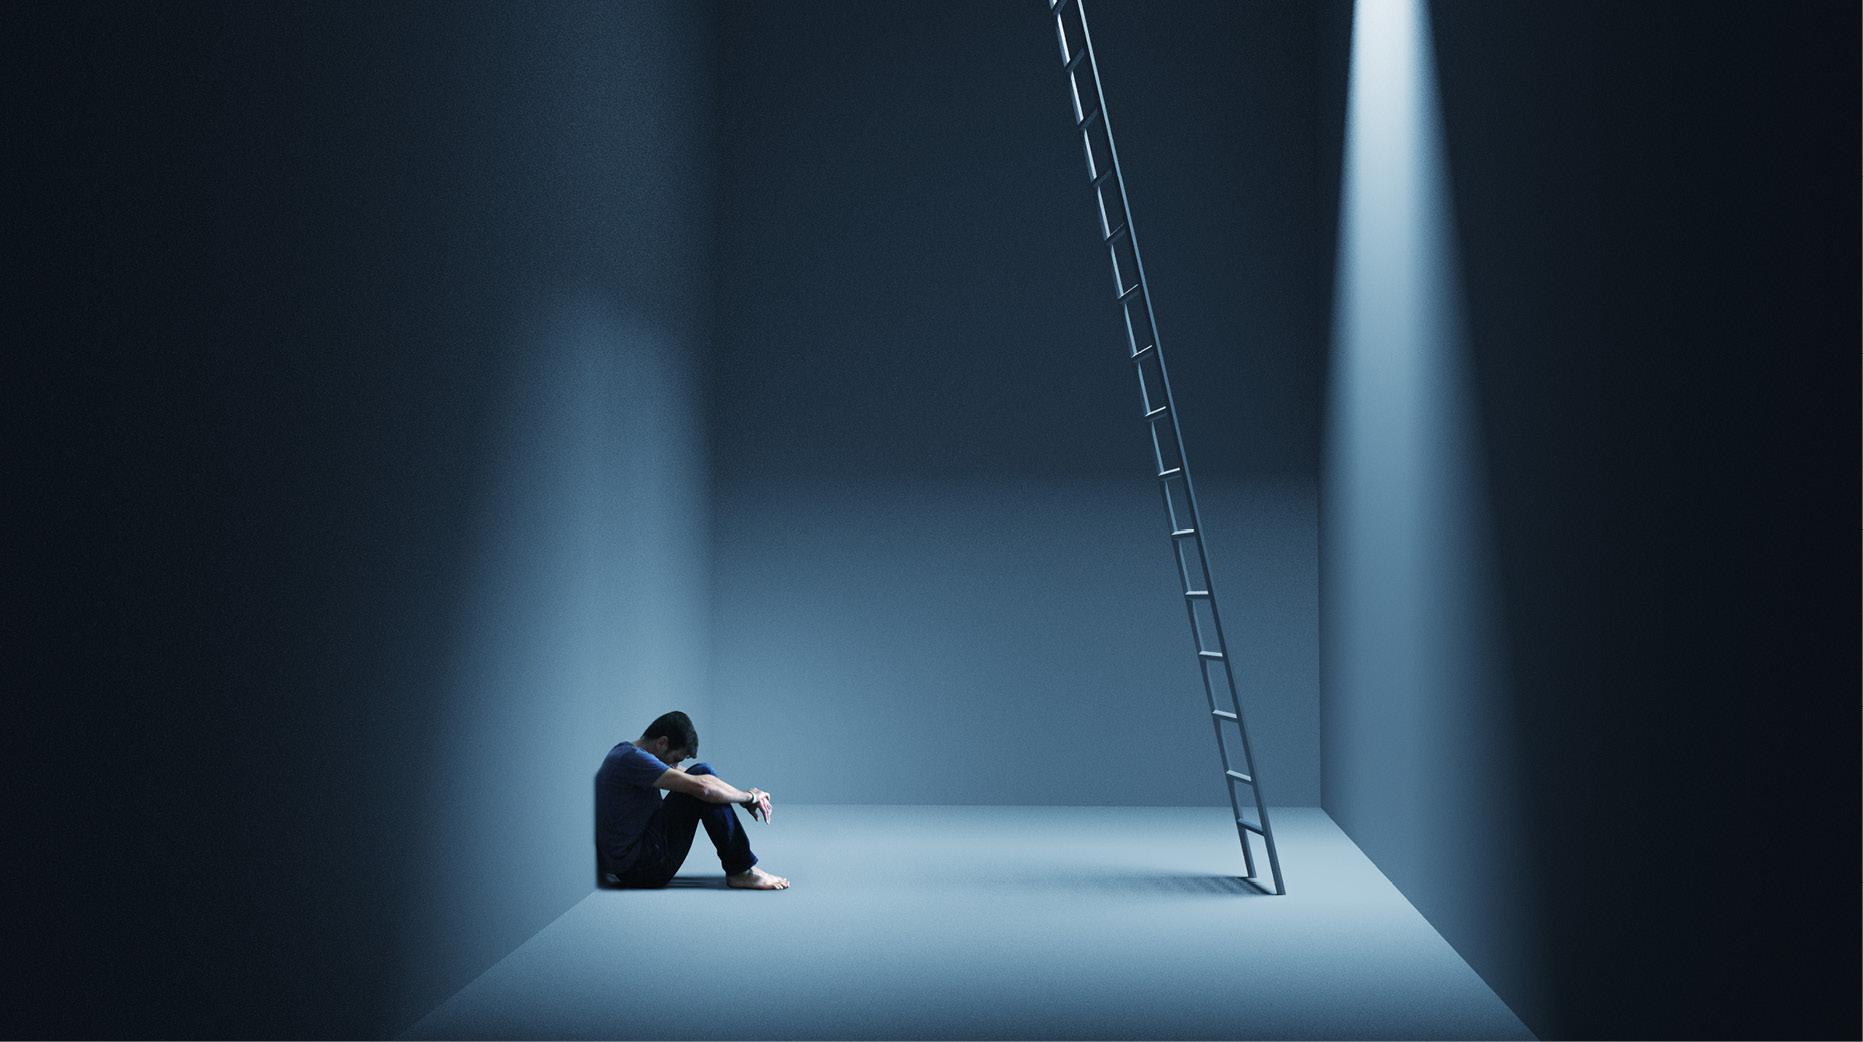 _heero-image-The Modern Health Crisis - Suicide